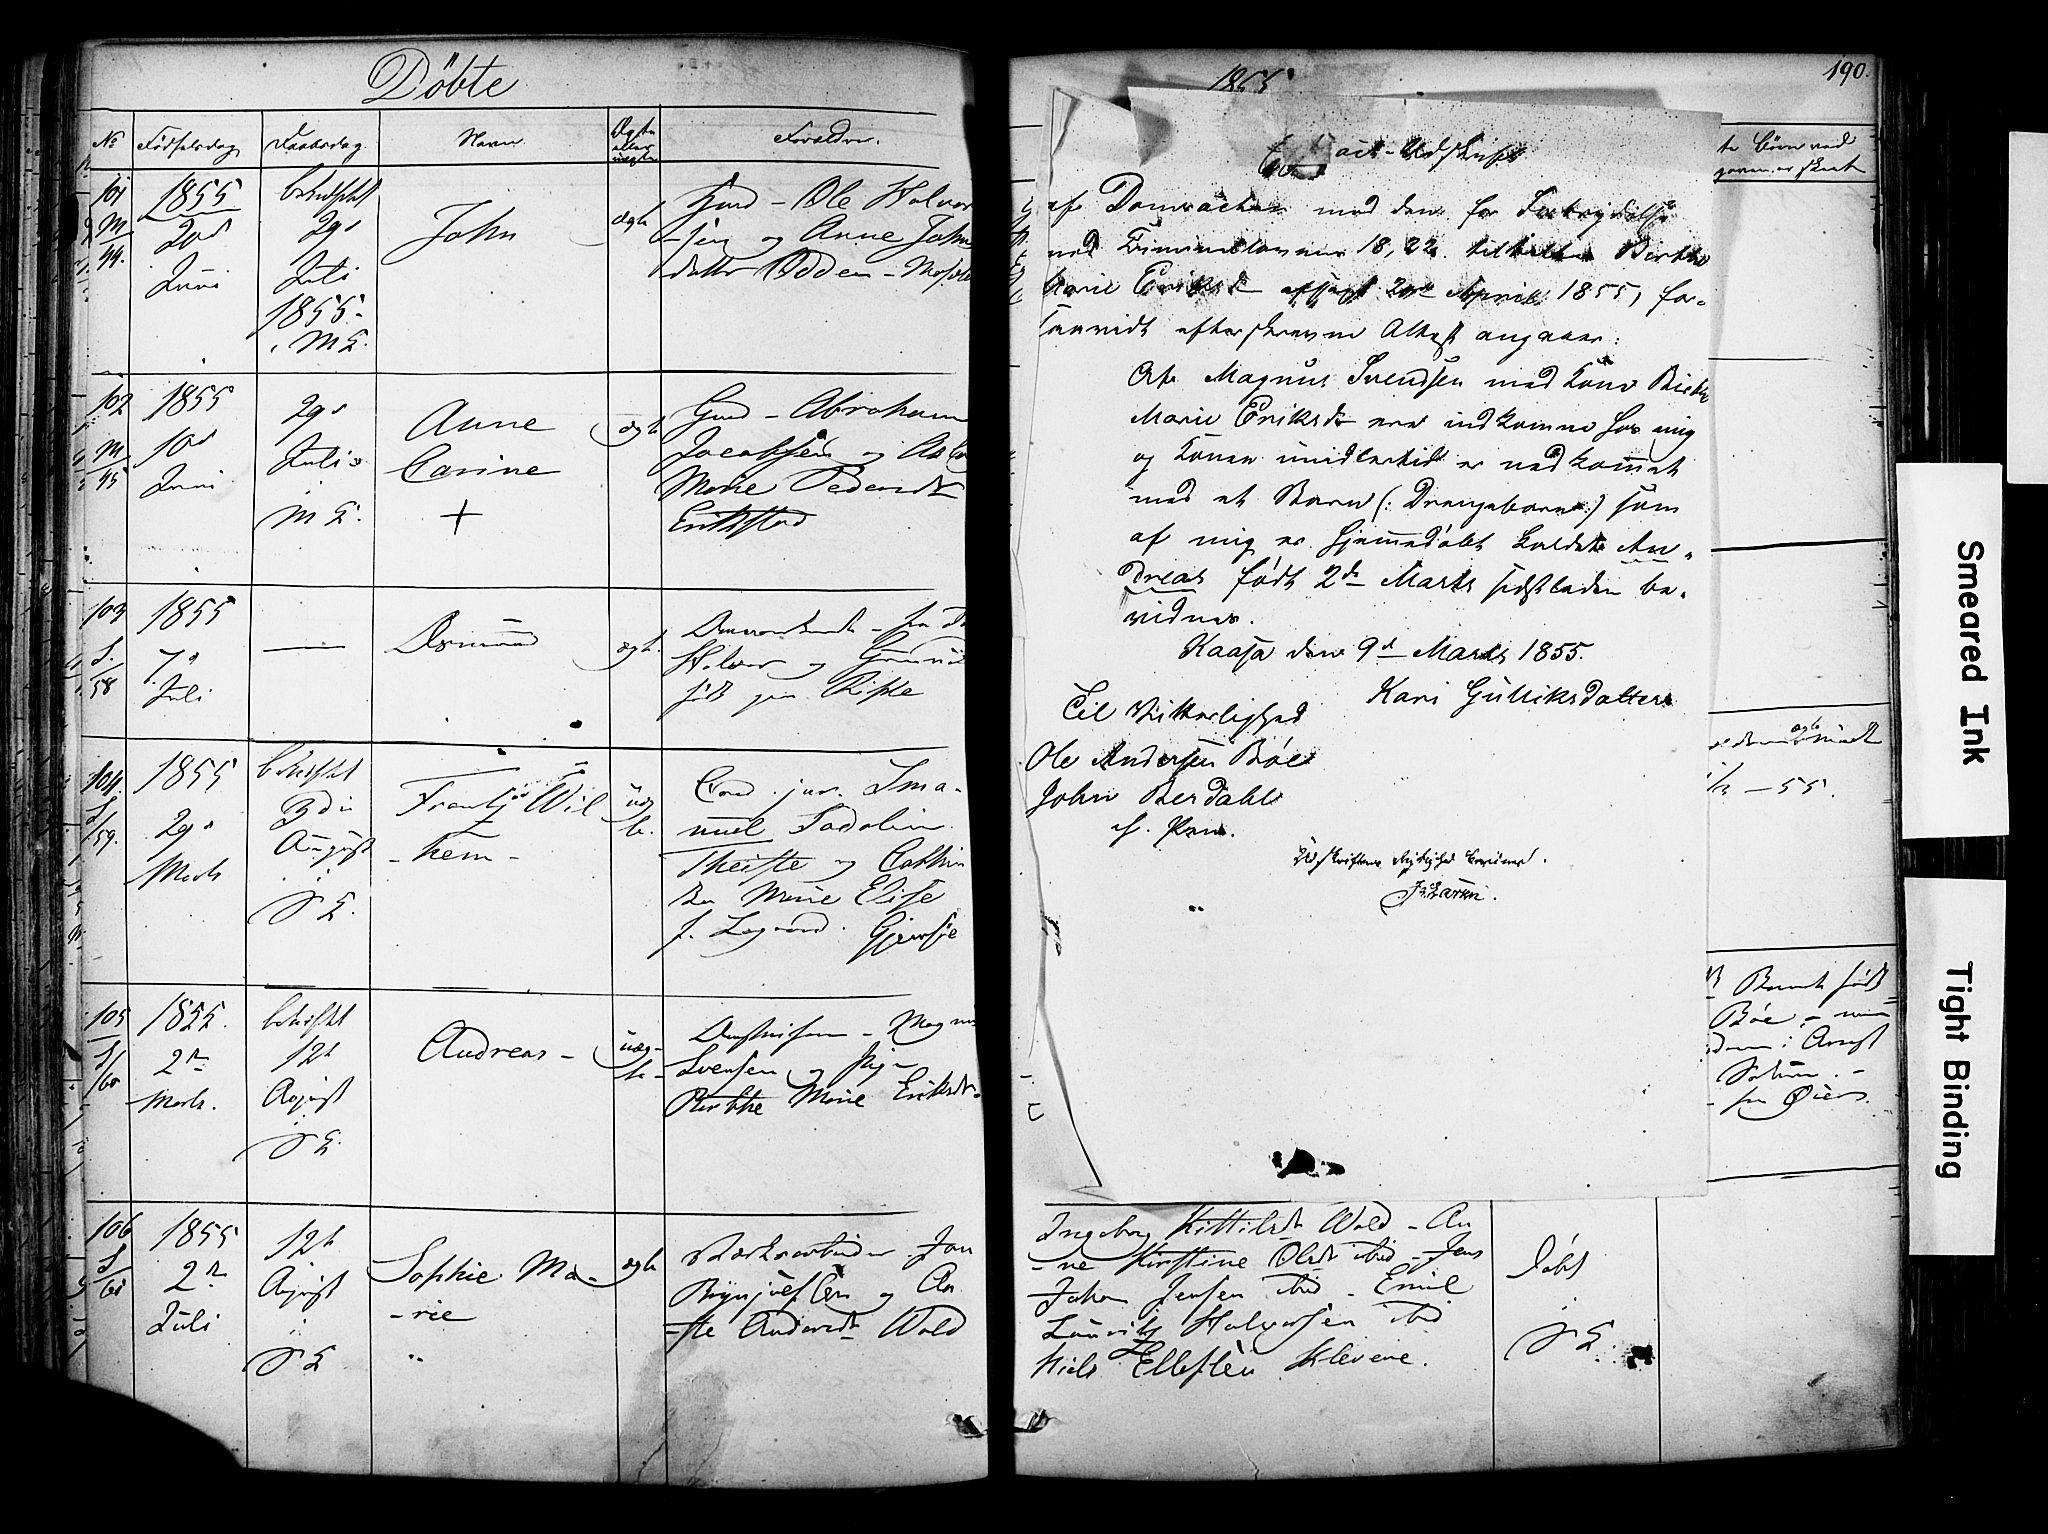 SAKO, Solum kirkebøker, F/Fa/L0006: Ministerialbok nr. I 6, 1844-1855, s. 190